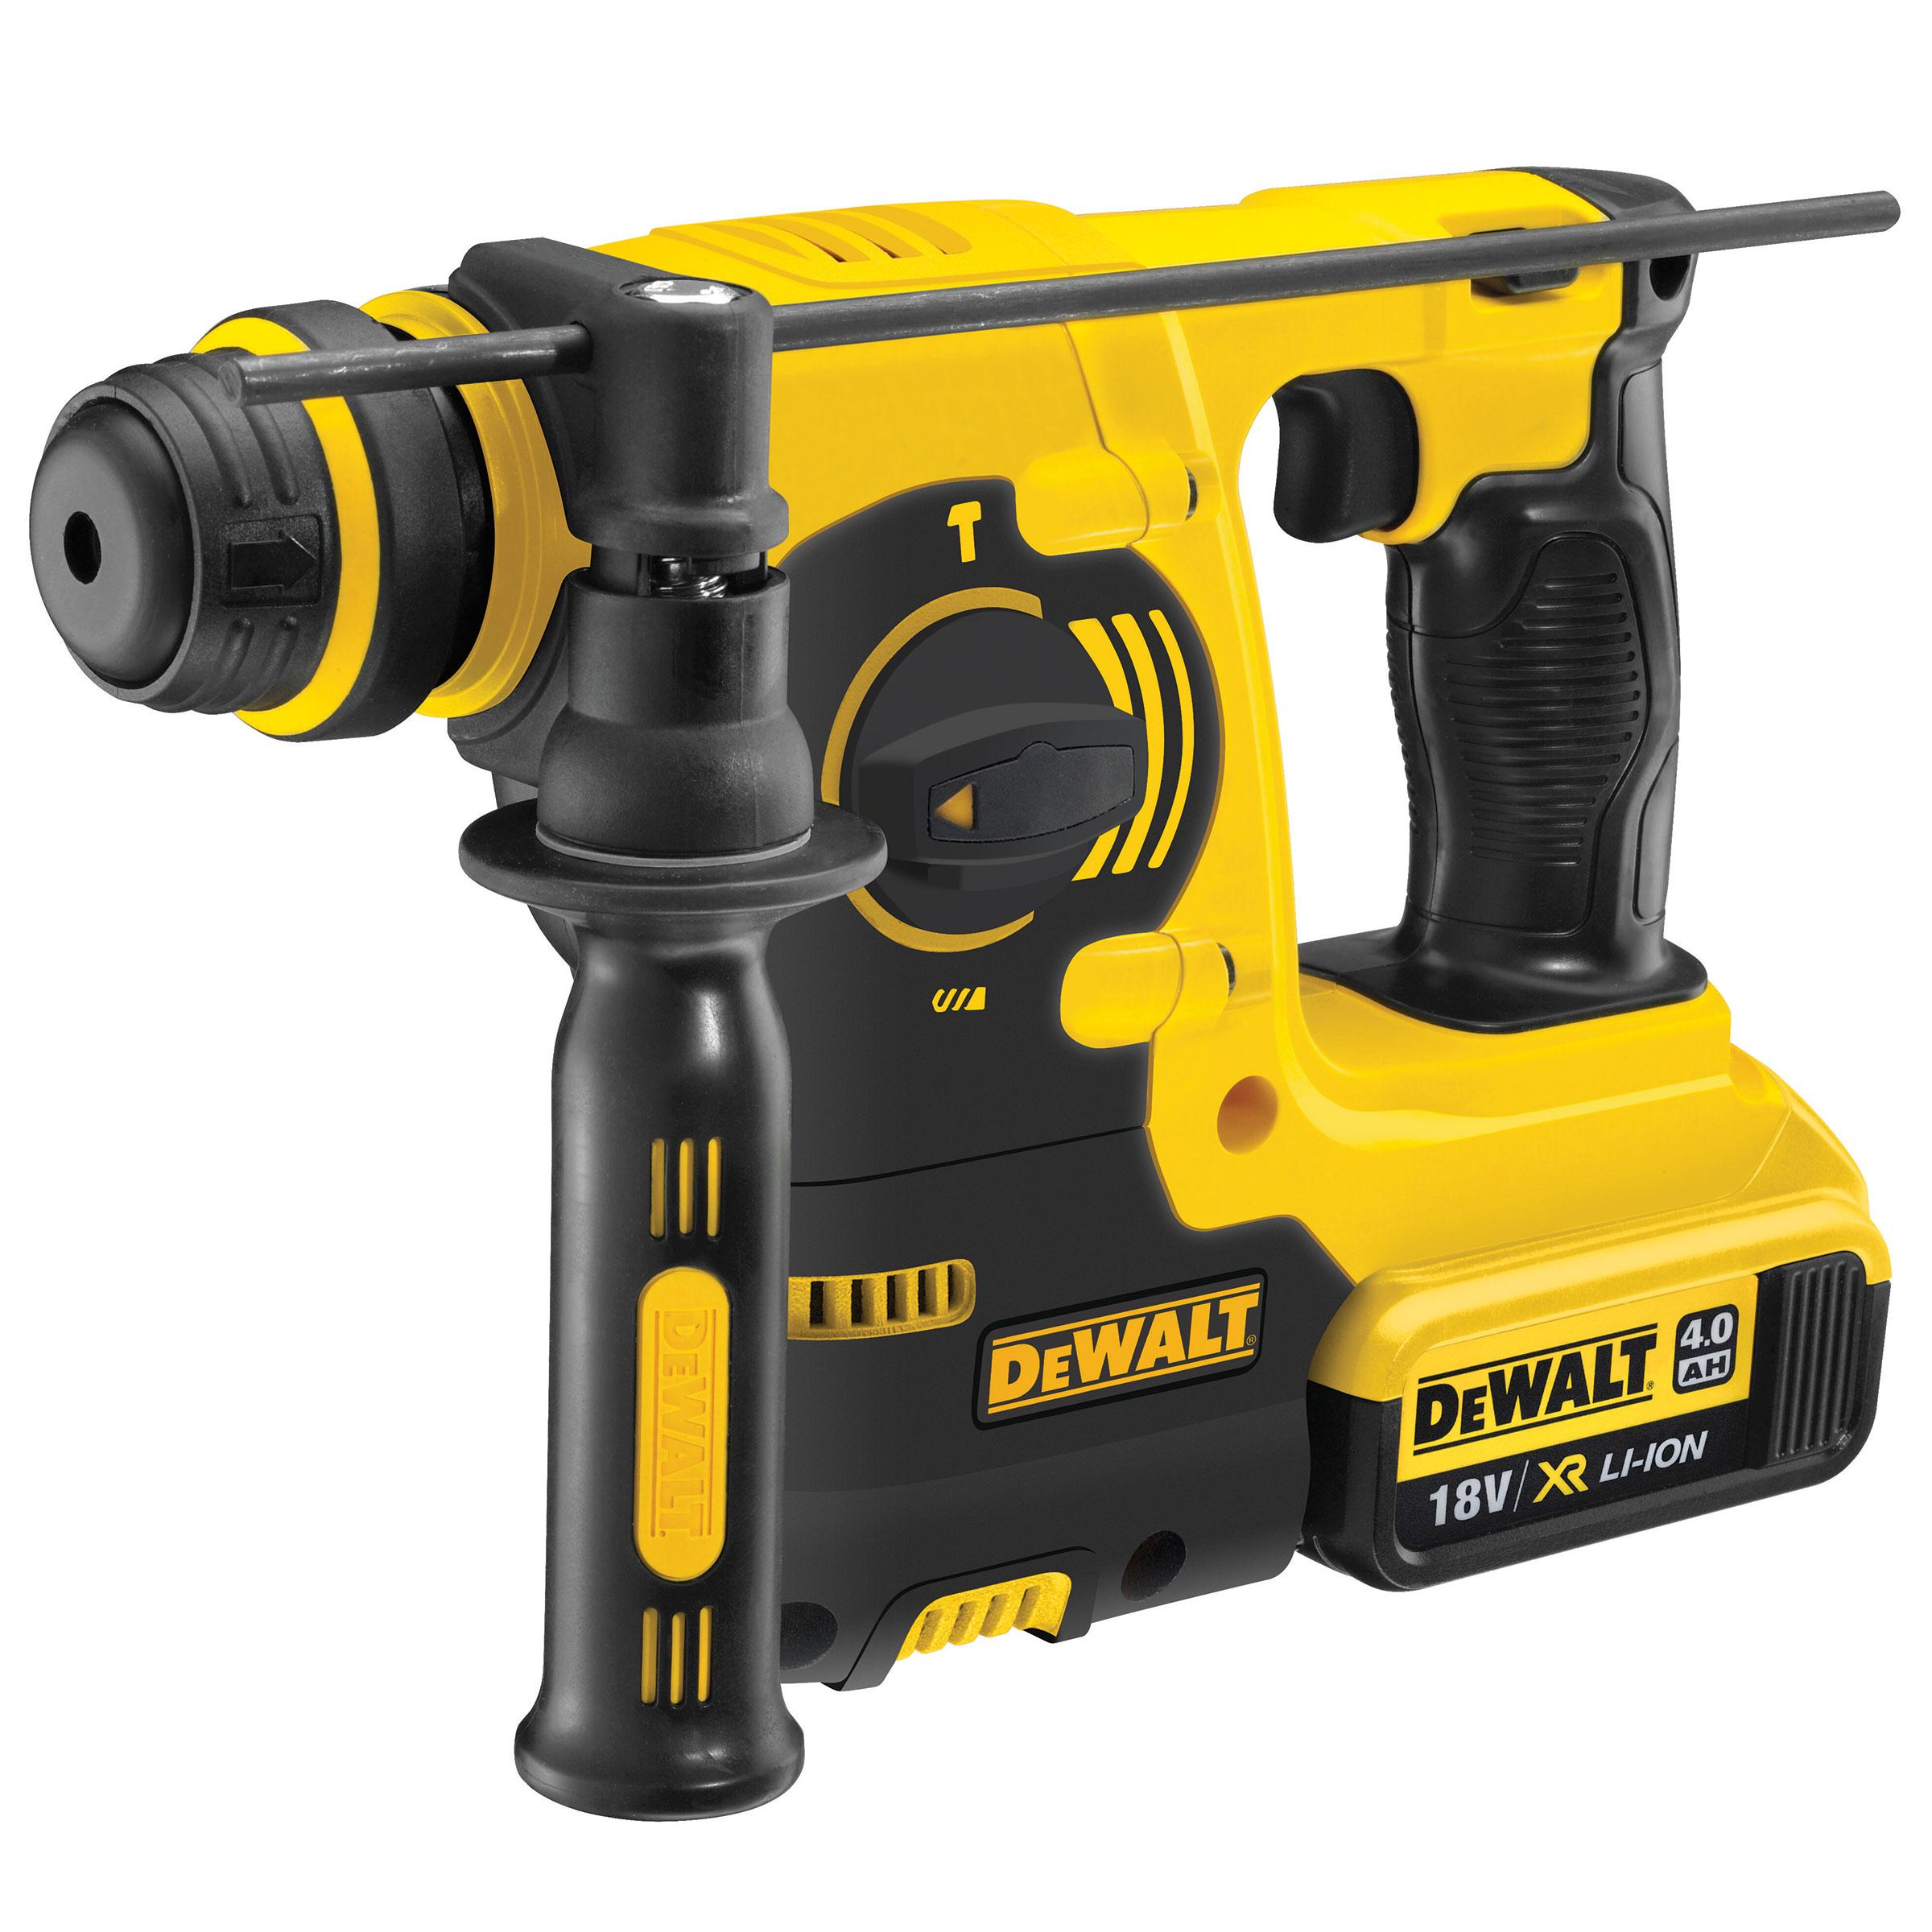 Toolstop Dewalt Dch253m2 18v Xr Li Ion Sds Rotary Hammer